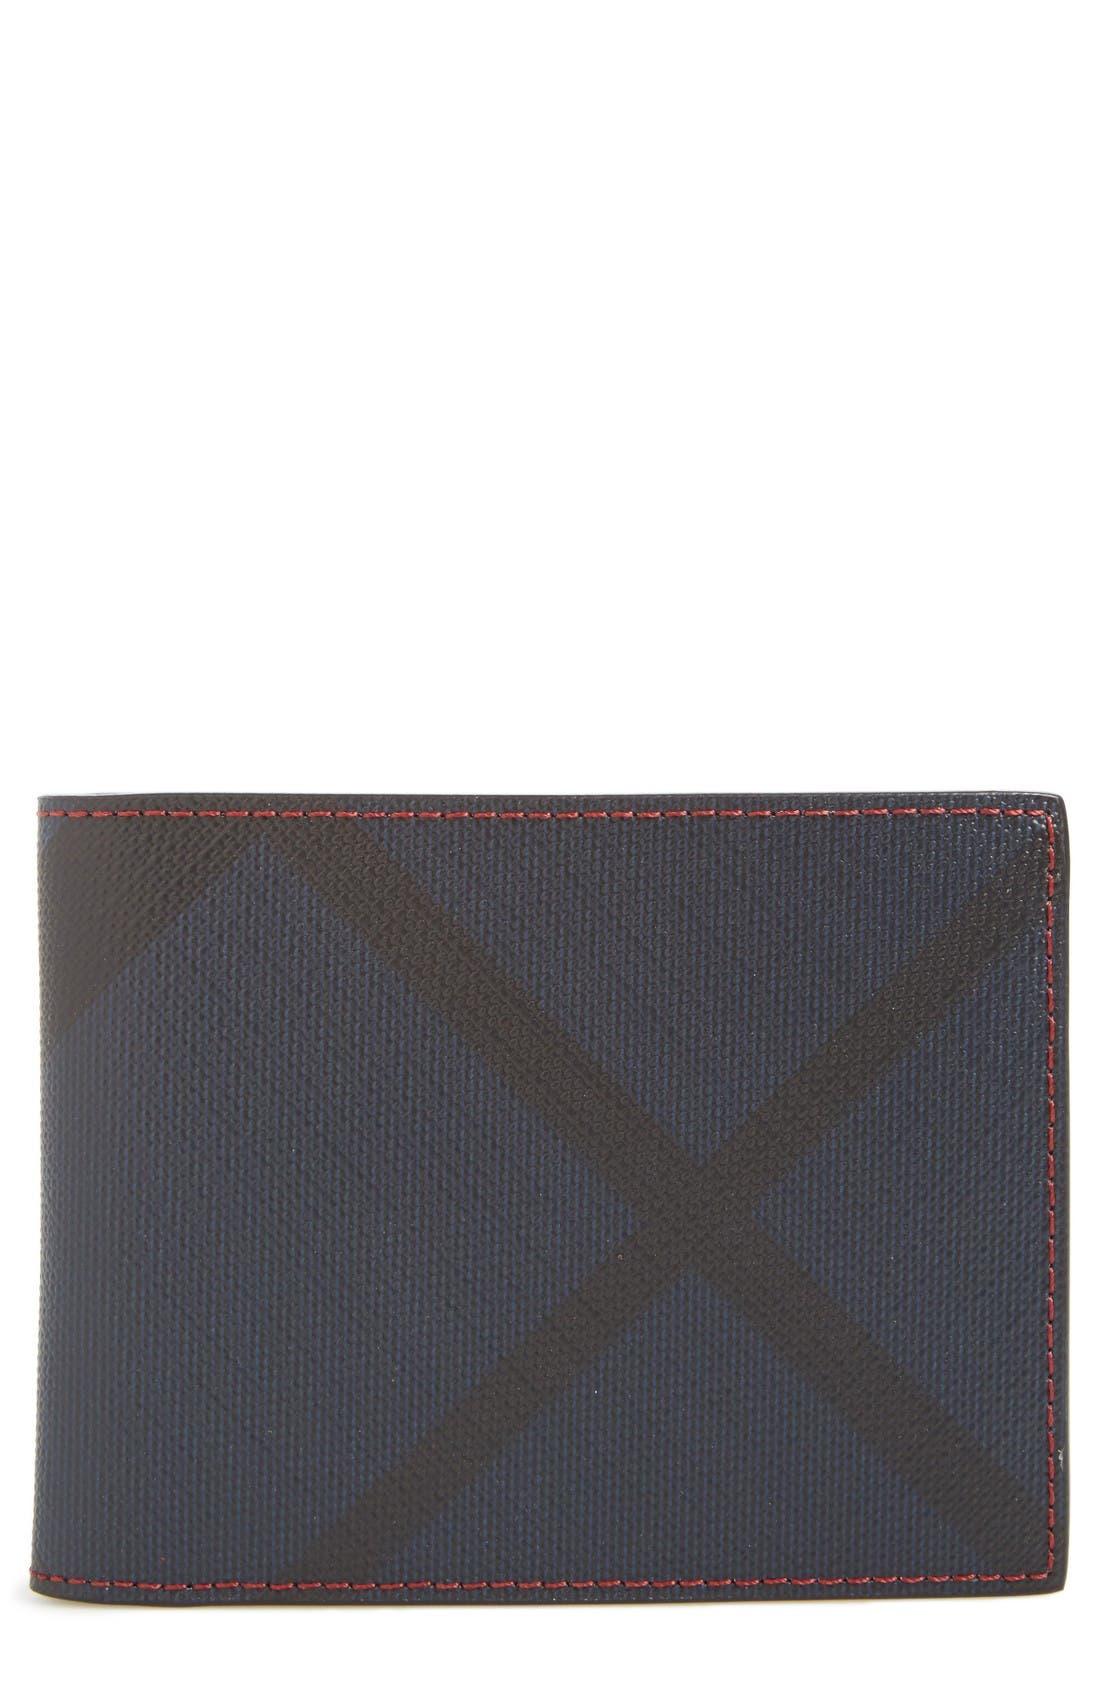 Main Image - Burberry Sandon Wallet